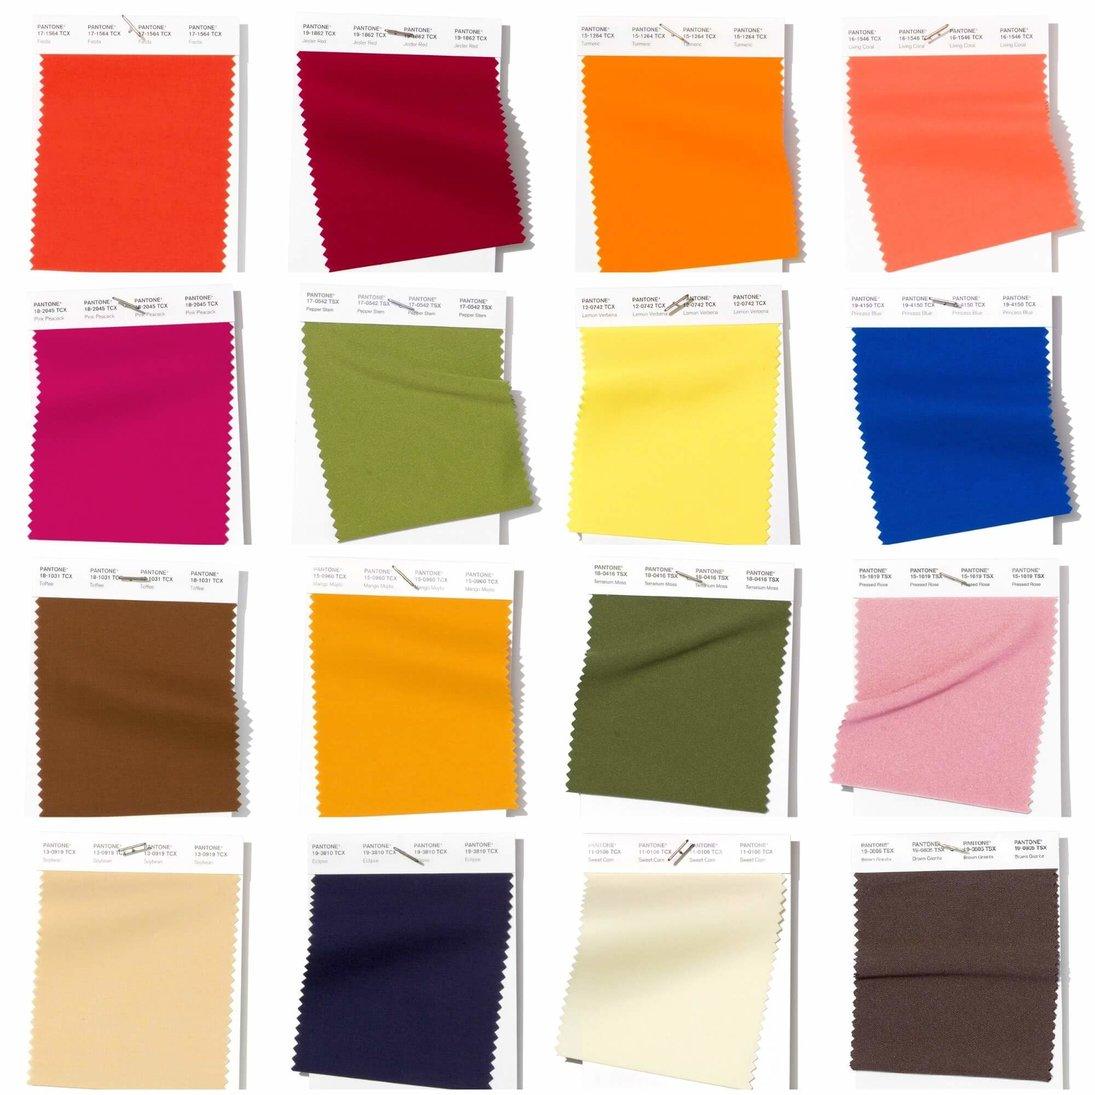 Meet the color palette for 2019 according to Pantone color paletteMeet the color palette for 2019 according to Pantonersz cveta pantone 2019 totally modnie ottenki vesna leto cveta